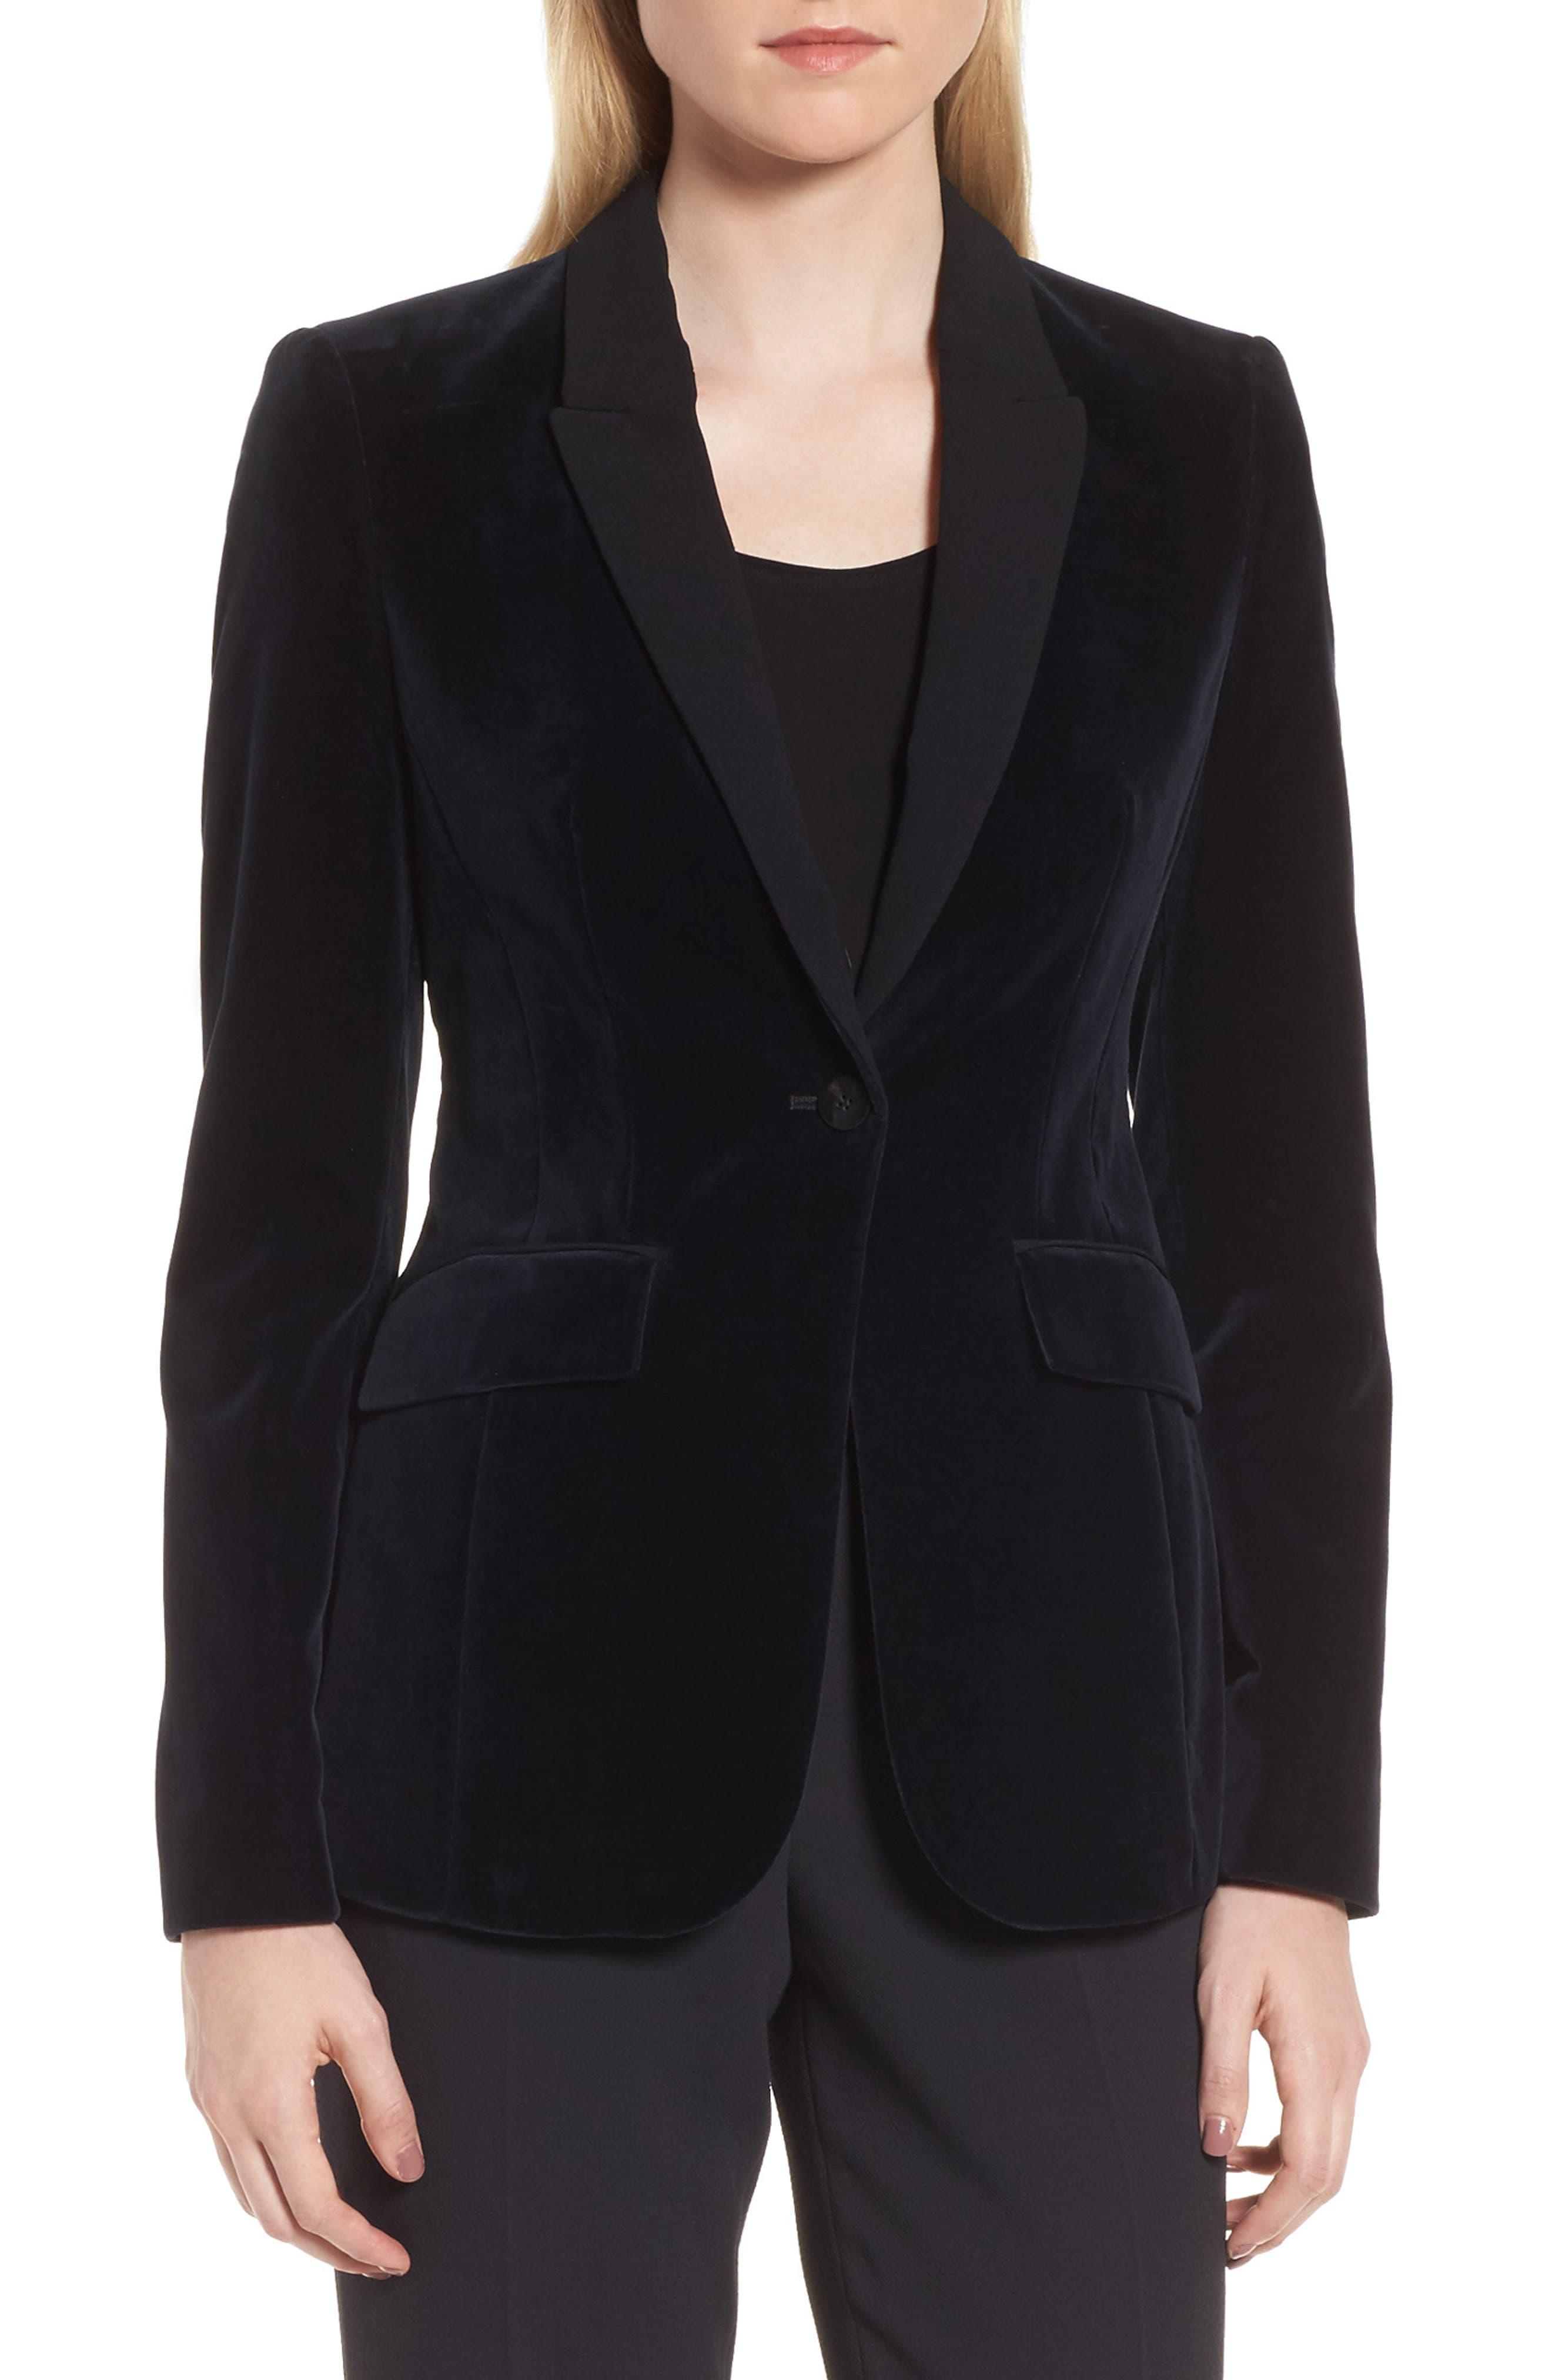 Jeronala Velvet Tuxedo Jacket,                             Main thumbnail 1, color,                             480